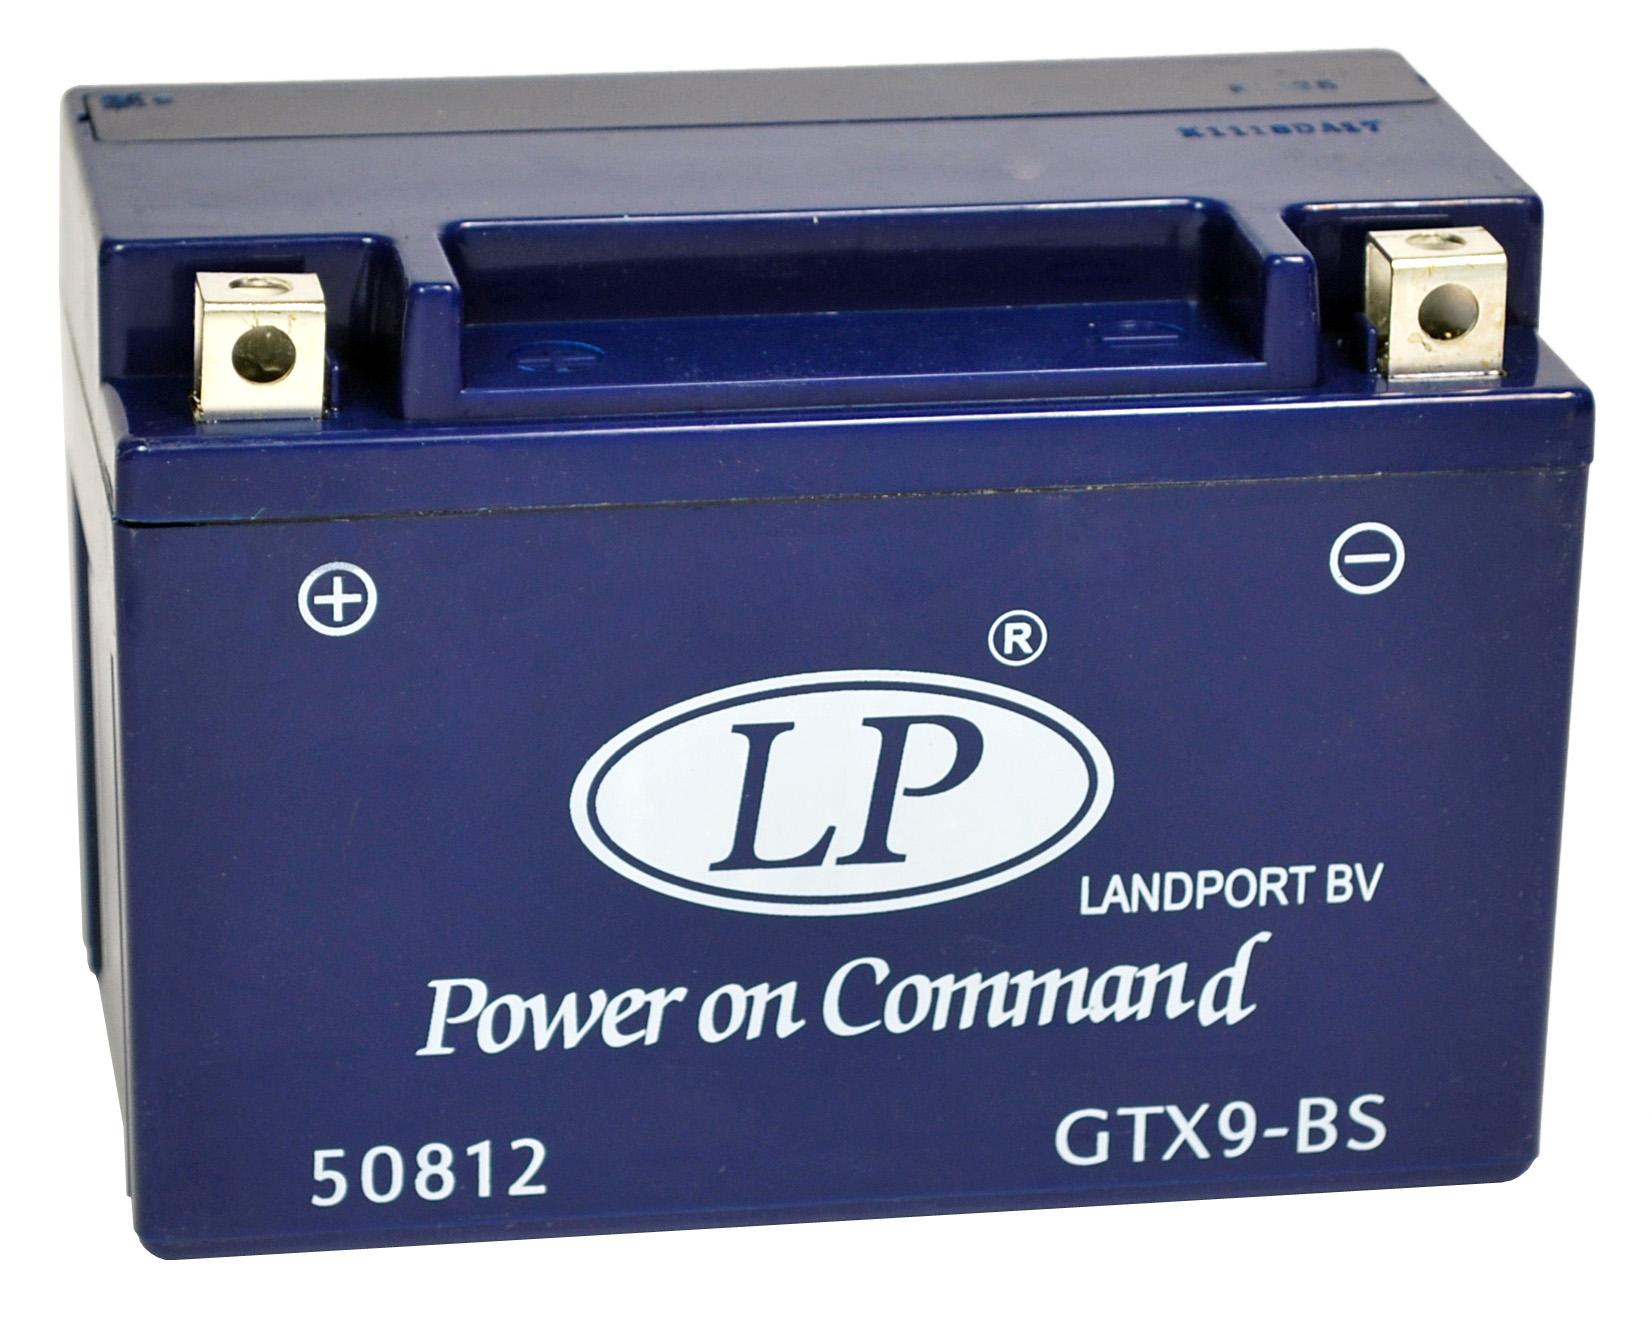 GTX9-BS motor accu Gel